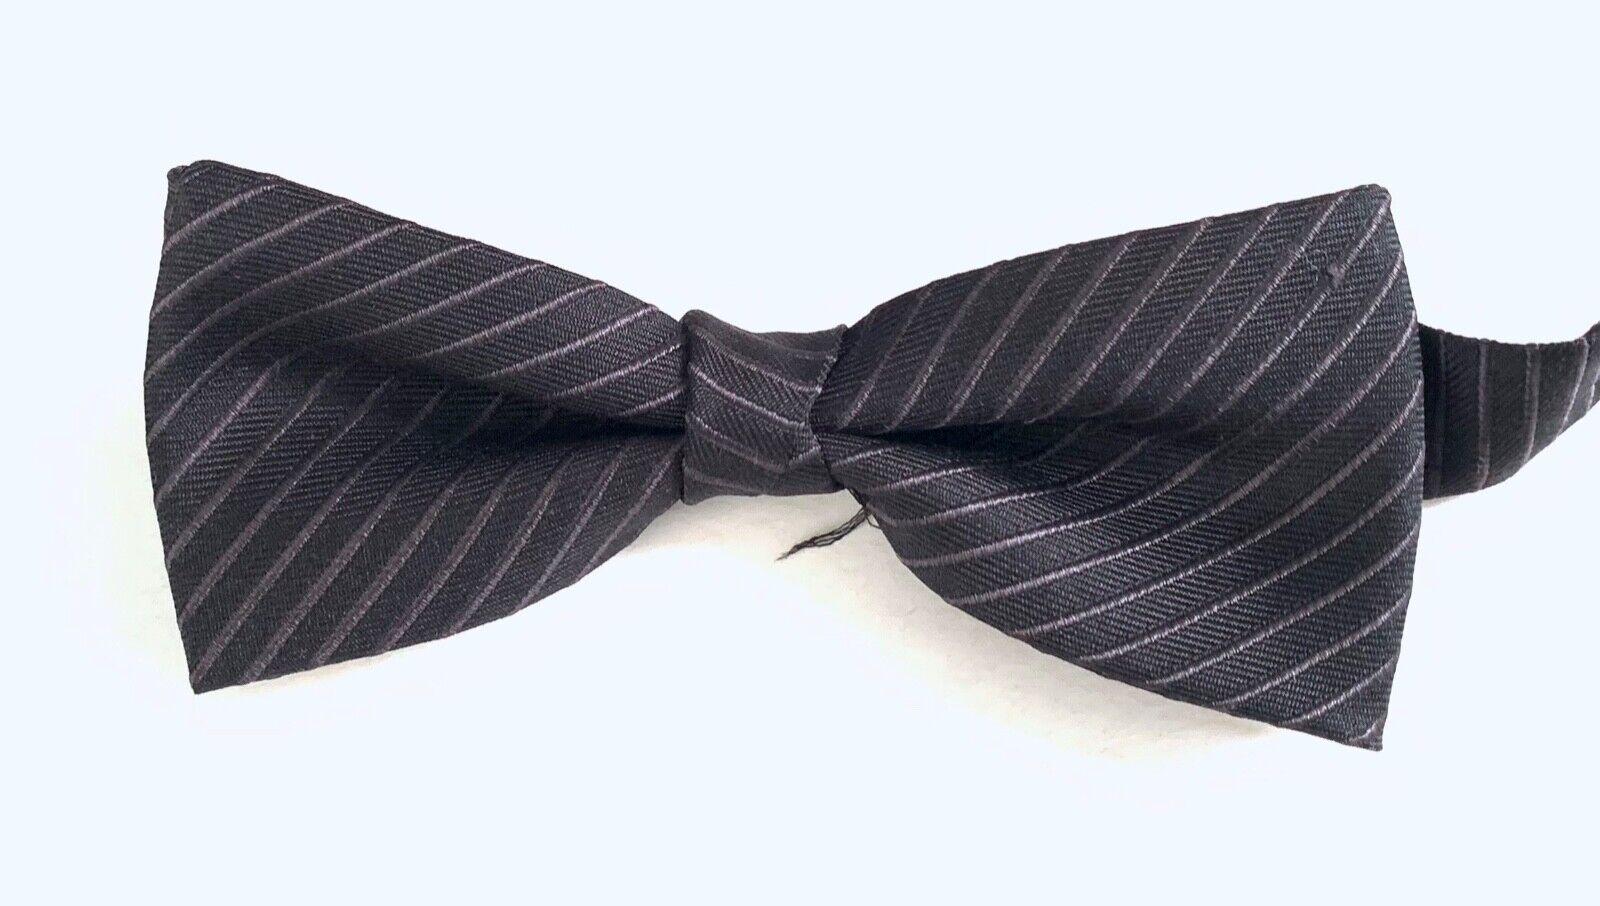 Liu Jo Papillon Flywedd Silk Bow Tie, Black, One Size